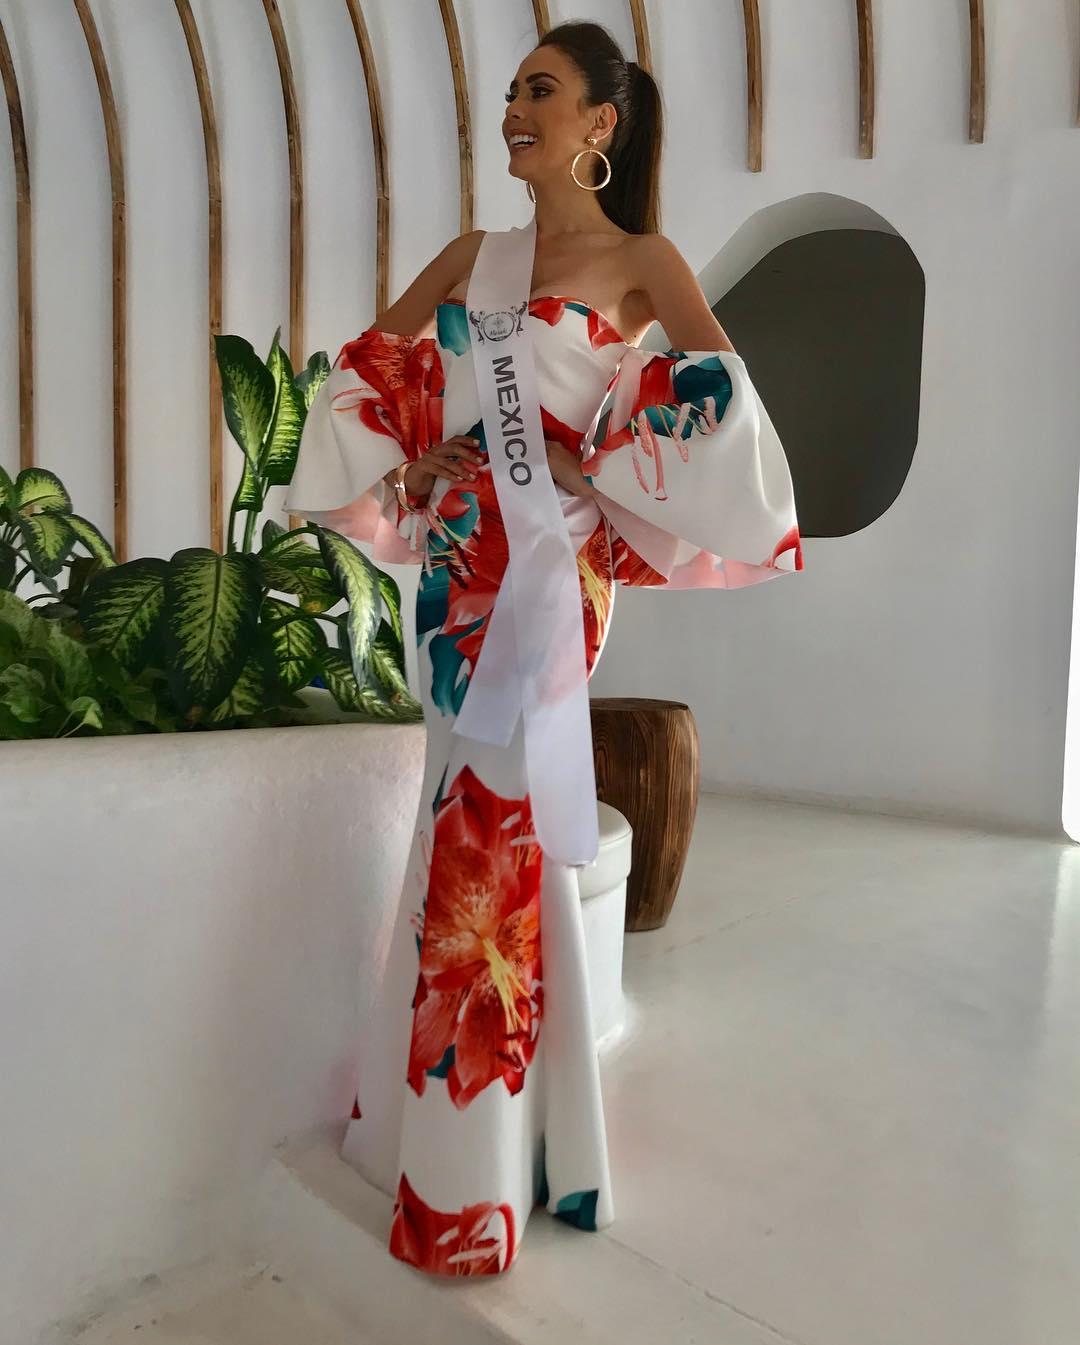 ivonne hernandez, semifinalista de top model of the world 2018. - Página 4 Cm9crs10